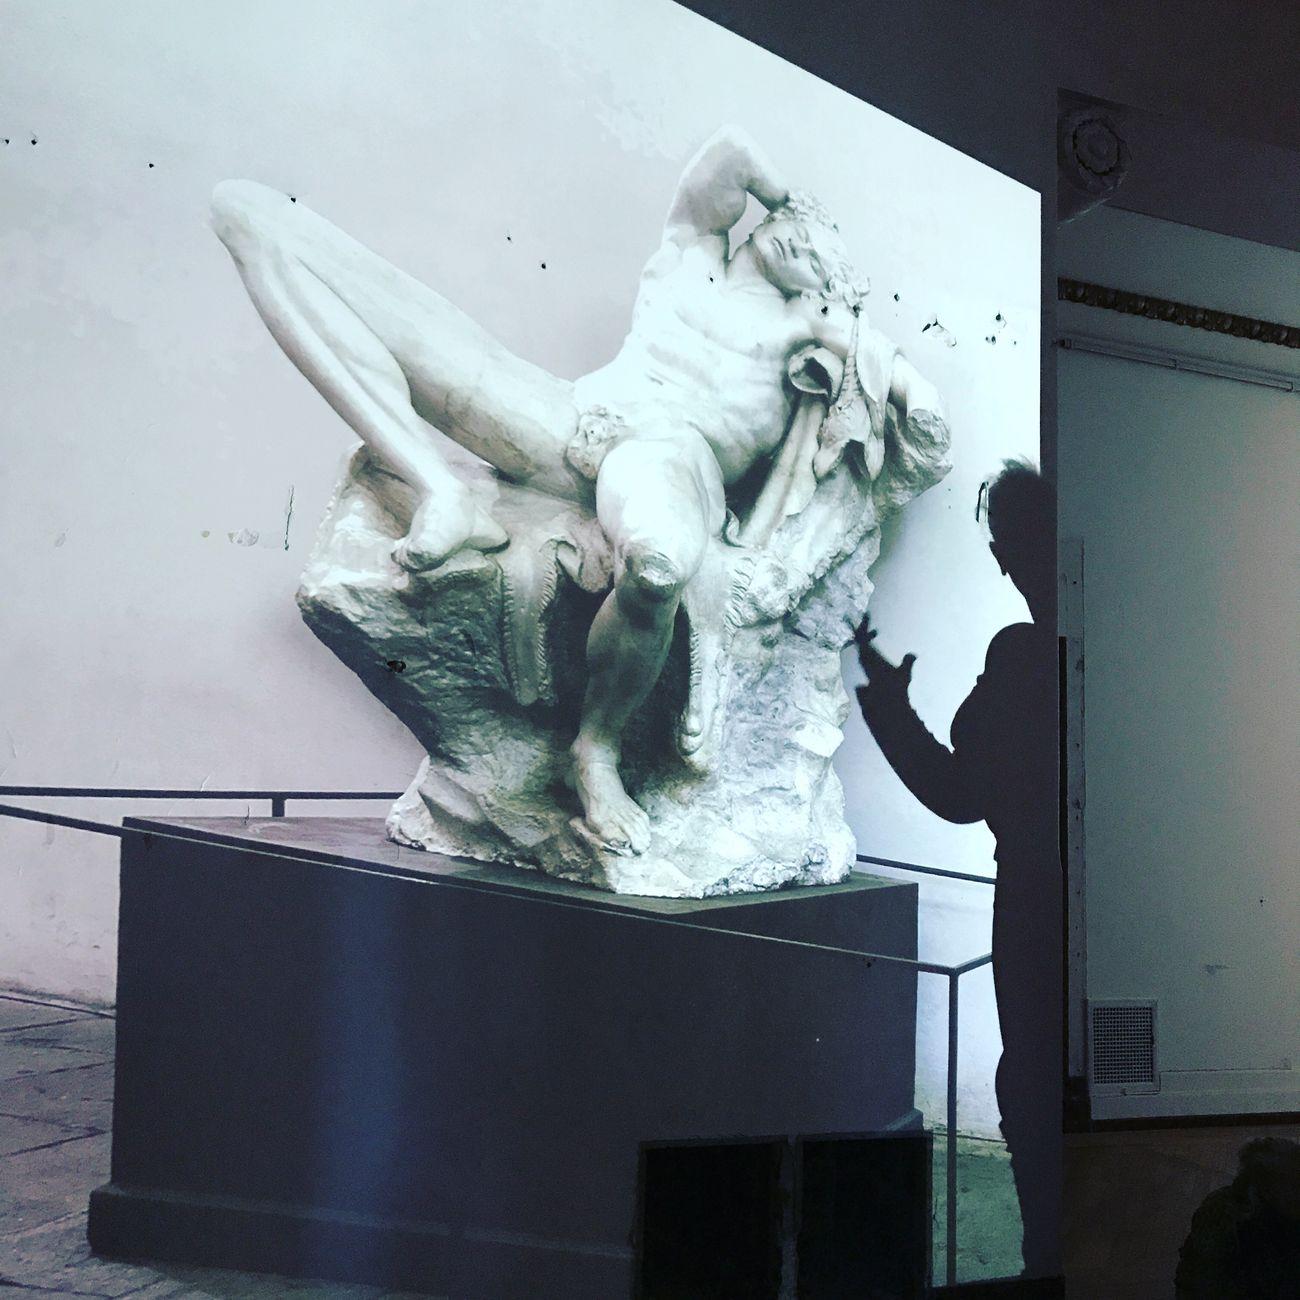 Marianne Heier, And Their Spirits Live On, Oslo 2019